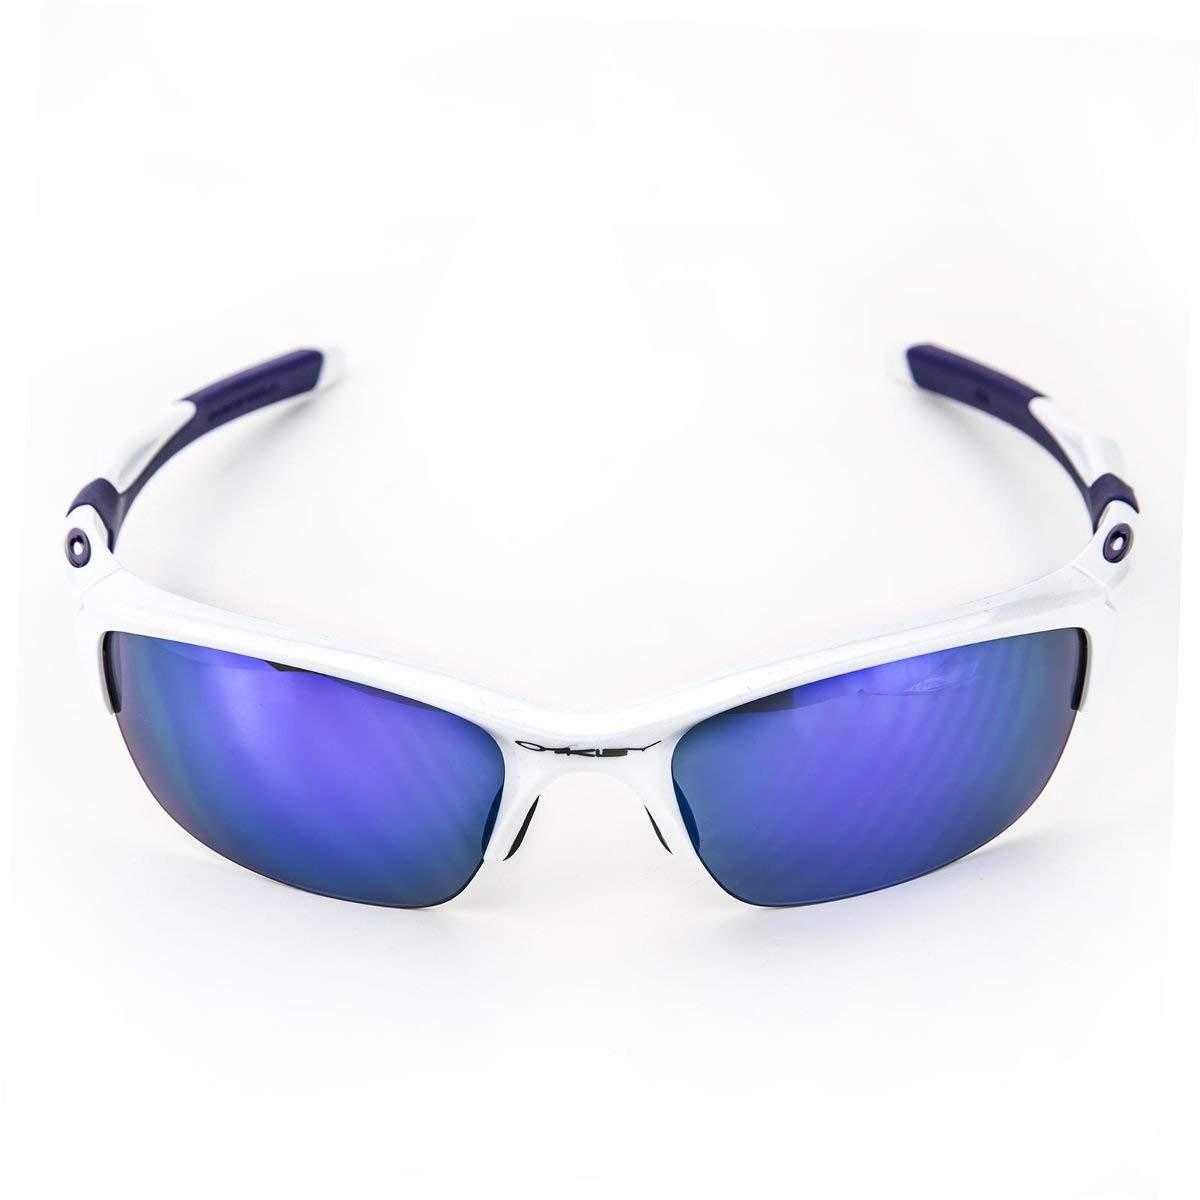 Oakley Men's OO9144 Half Jacket 2.0 Rectangular Sunglasses, Pearl/Violet Iridium, 62 mm